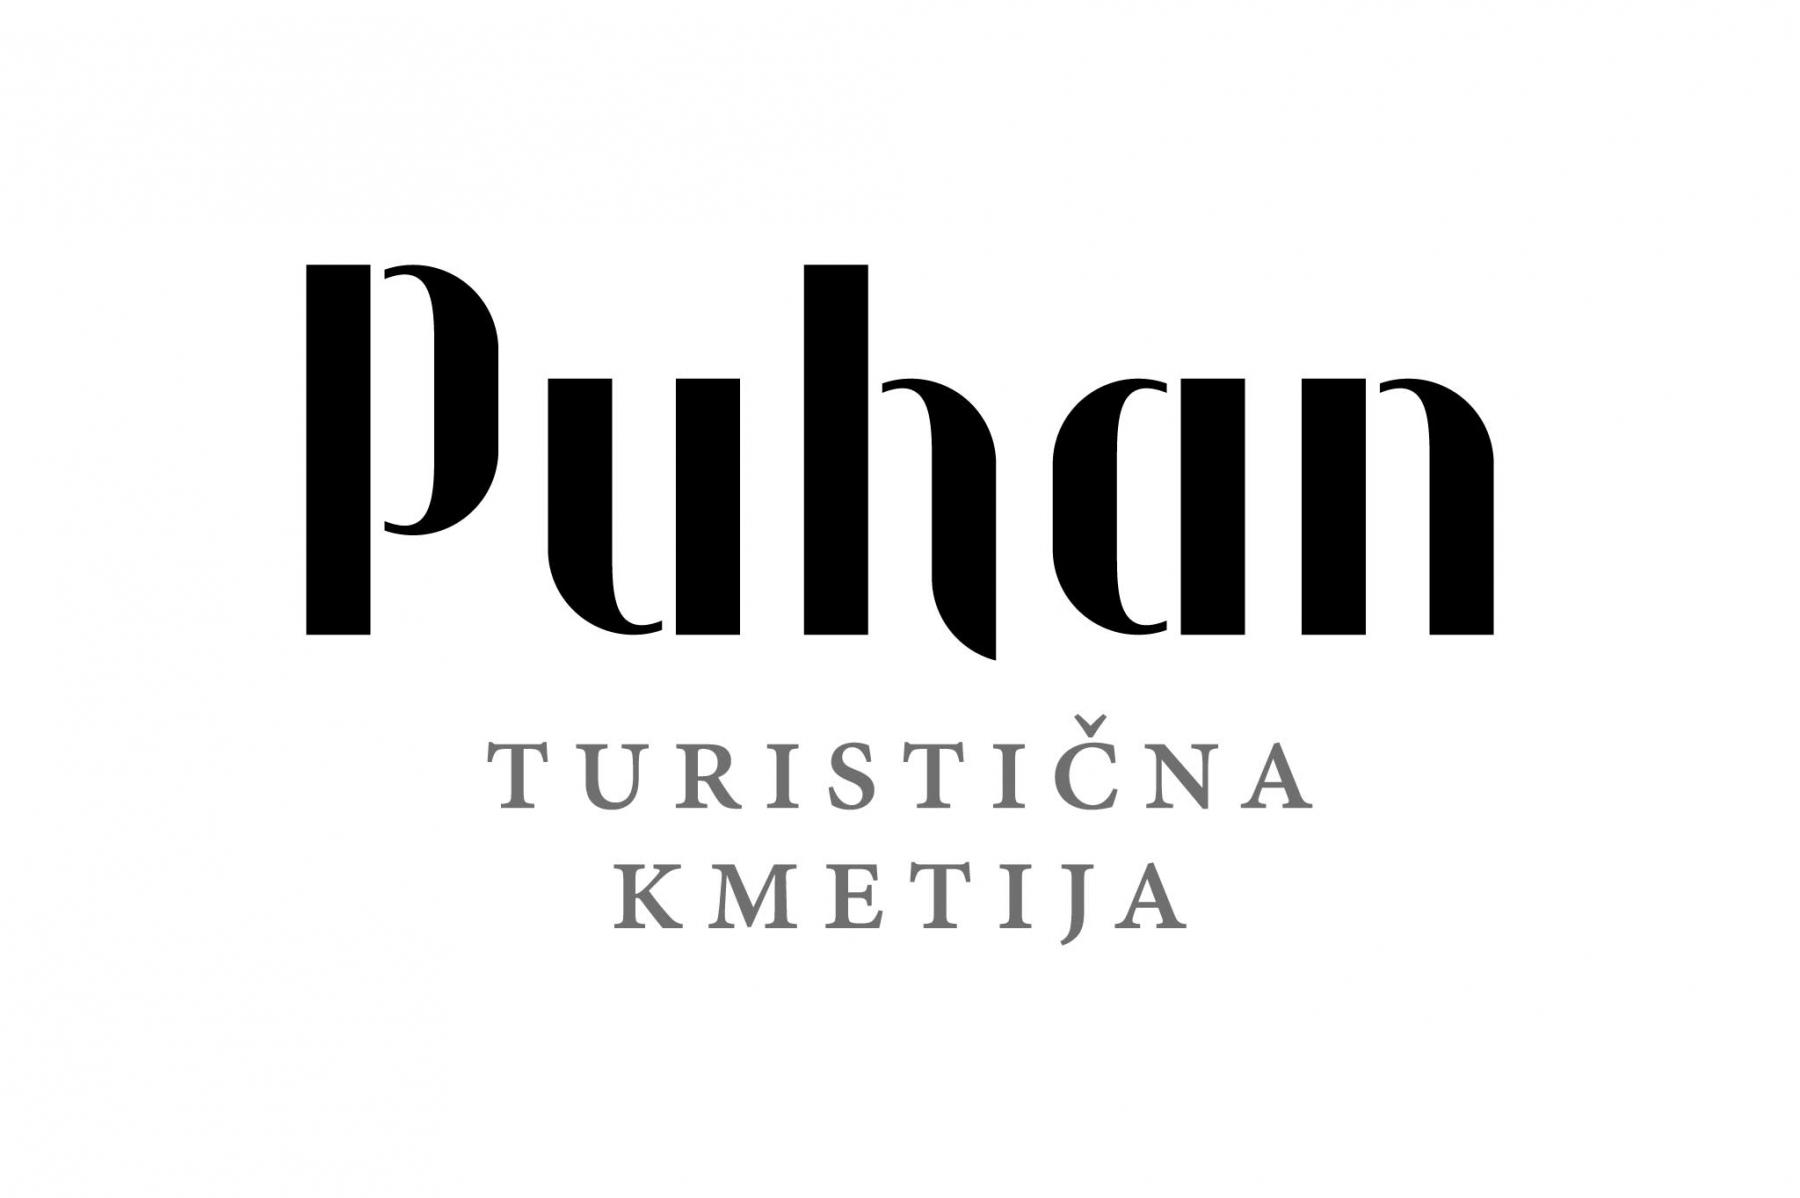 Turistična kmetija Puhan - logotip